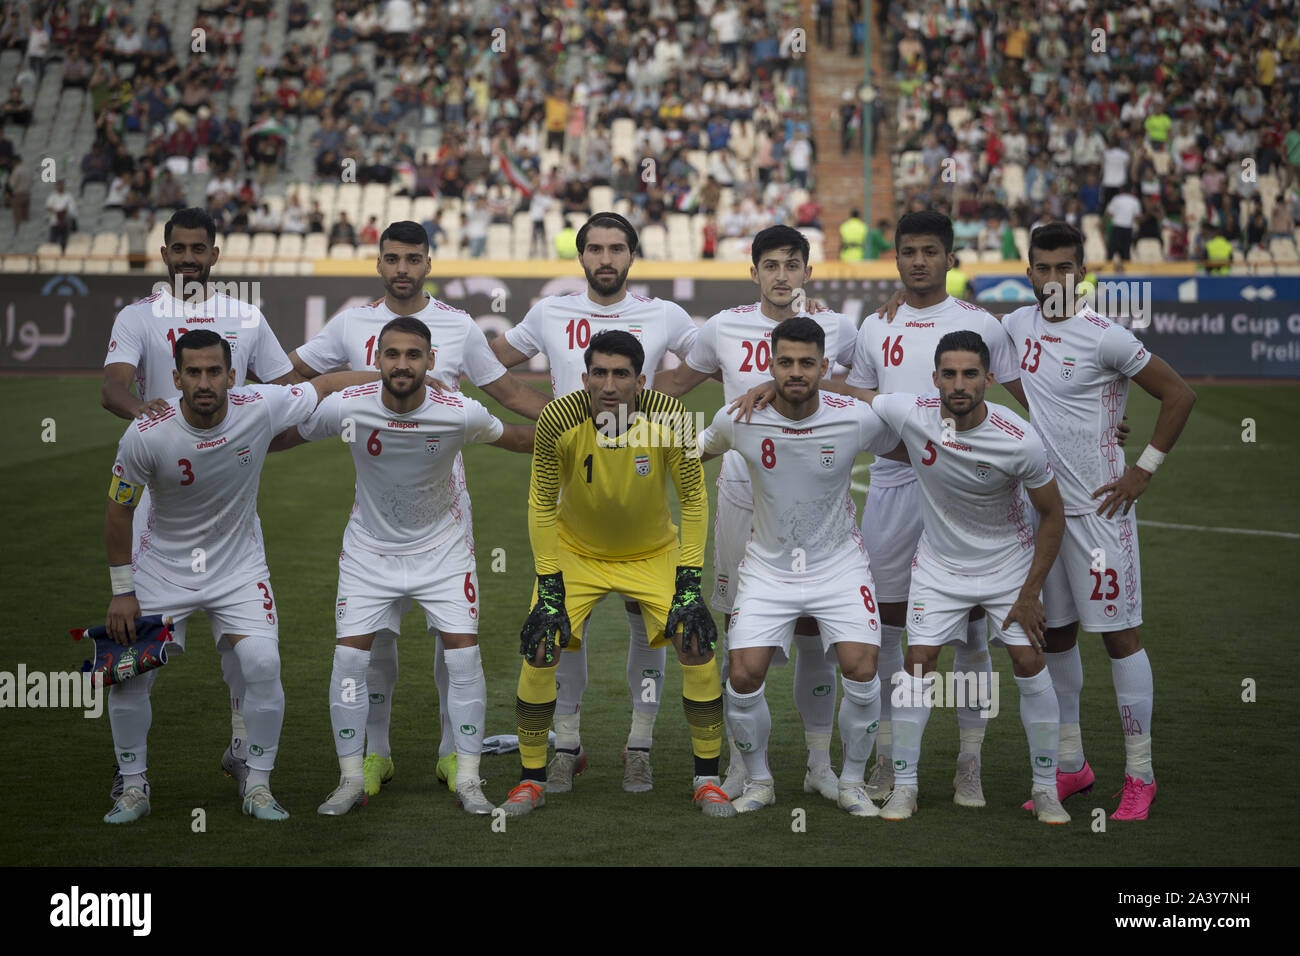 Fifa Wm 2019 Qualifikation Stockfotos Fifa Wm 2019